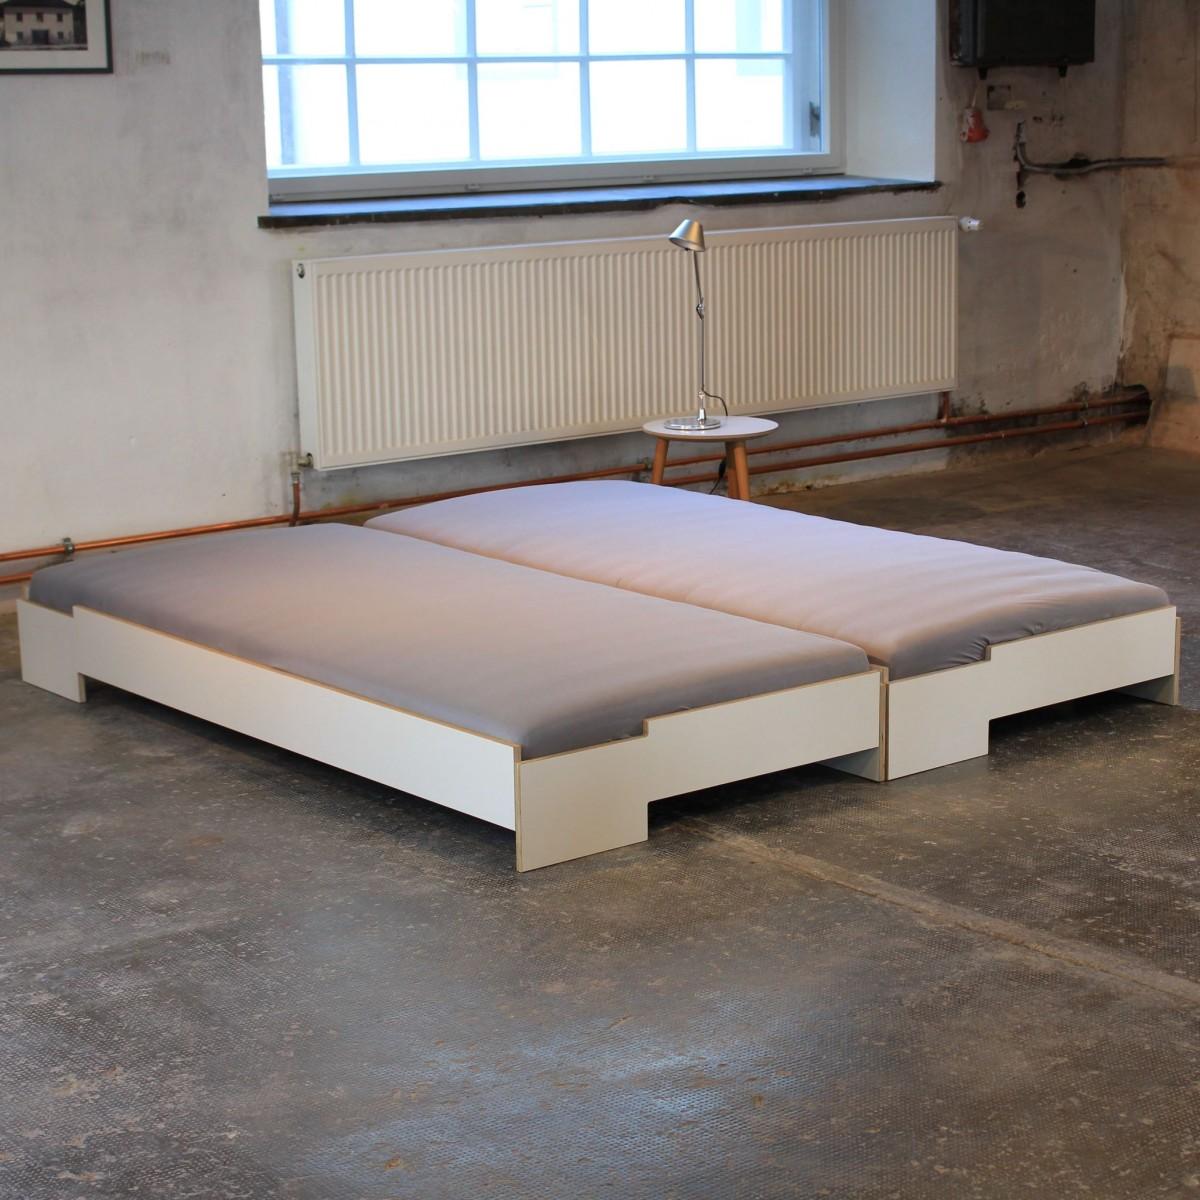 Bett²- Stapelbett ohne Kompromisse - Objekt Projekt - Design Award Gewinner 2020